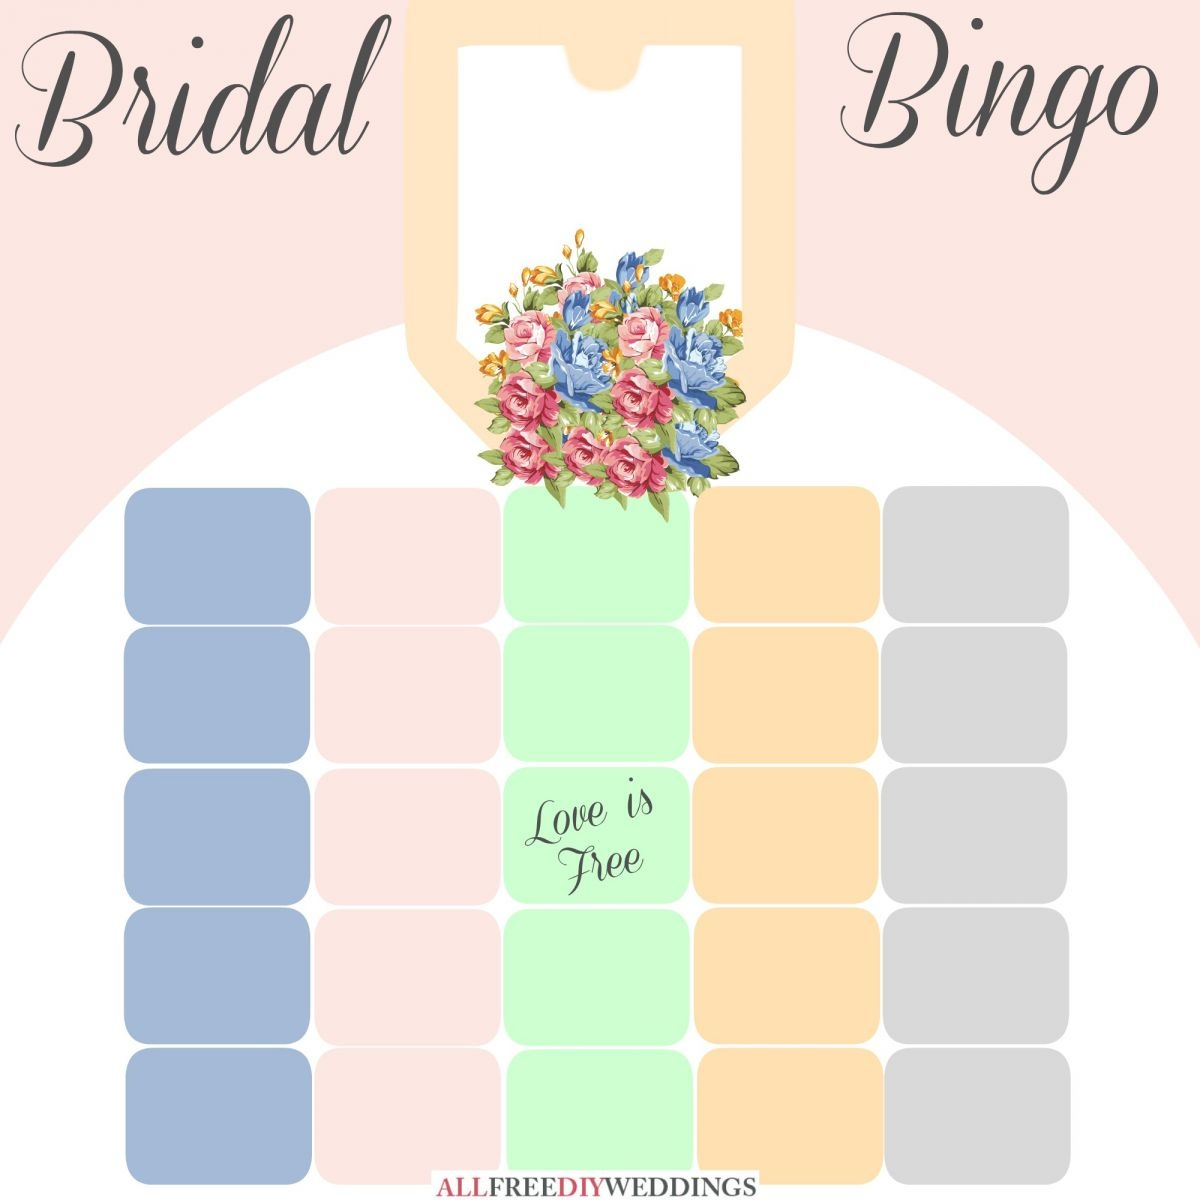 New Bridal Bingo: Free Bridal Shower Games | Allfreediyweddings - Free Printable Bridal Bingo Sheets